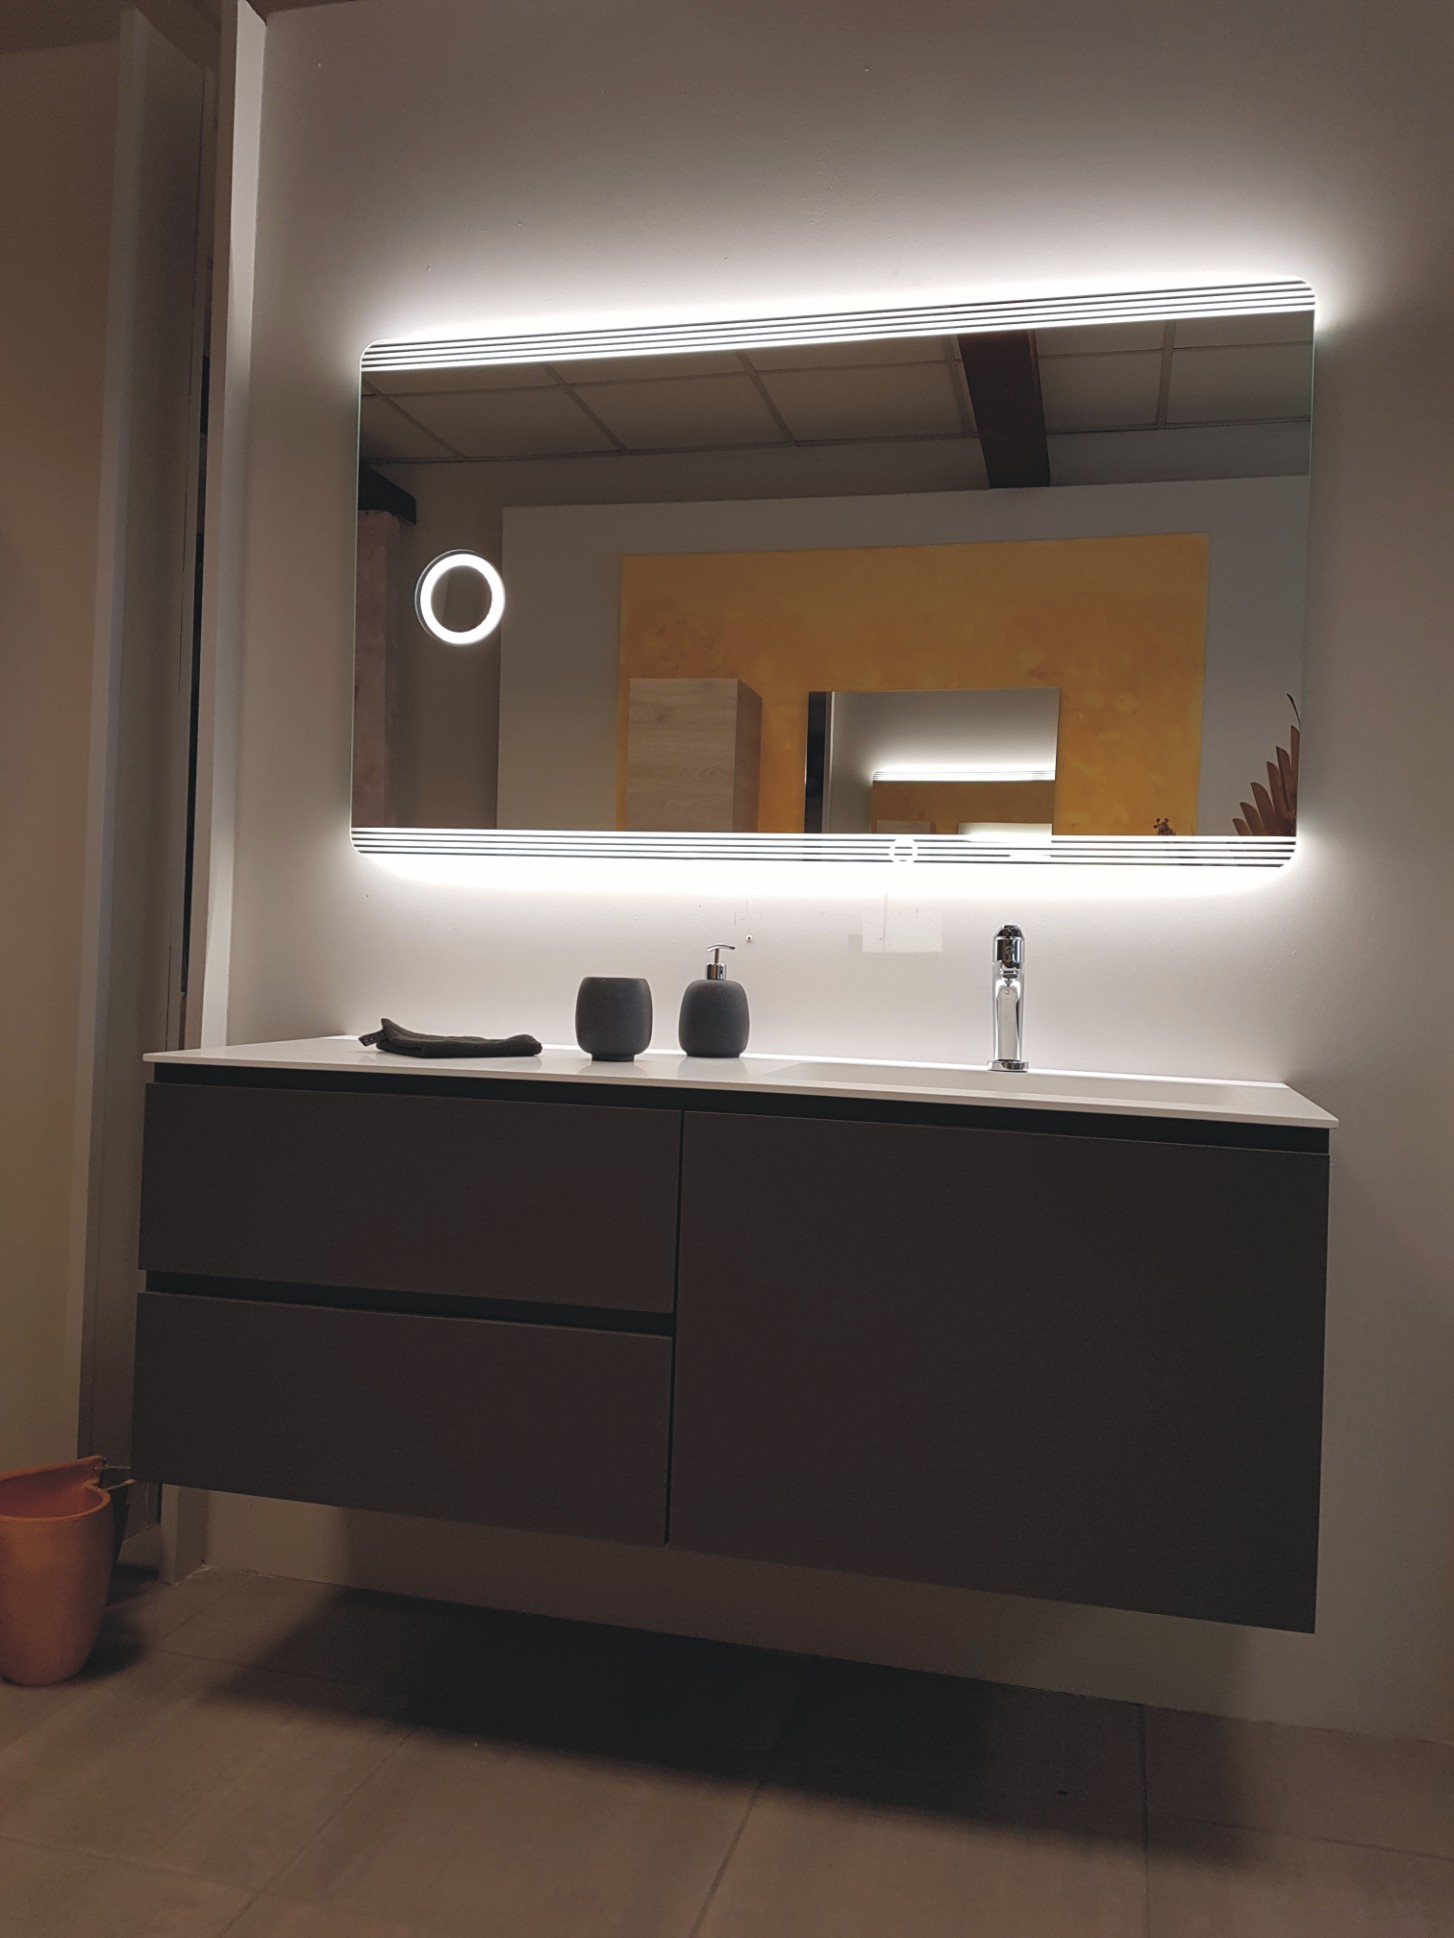 Offerta mobile bagno antracite outlet del bagno - Outlet del bagno rubiera ...